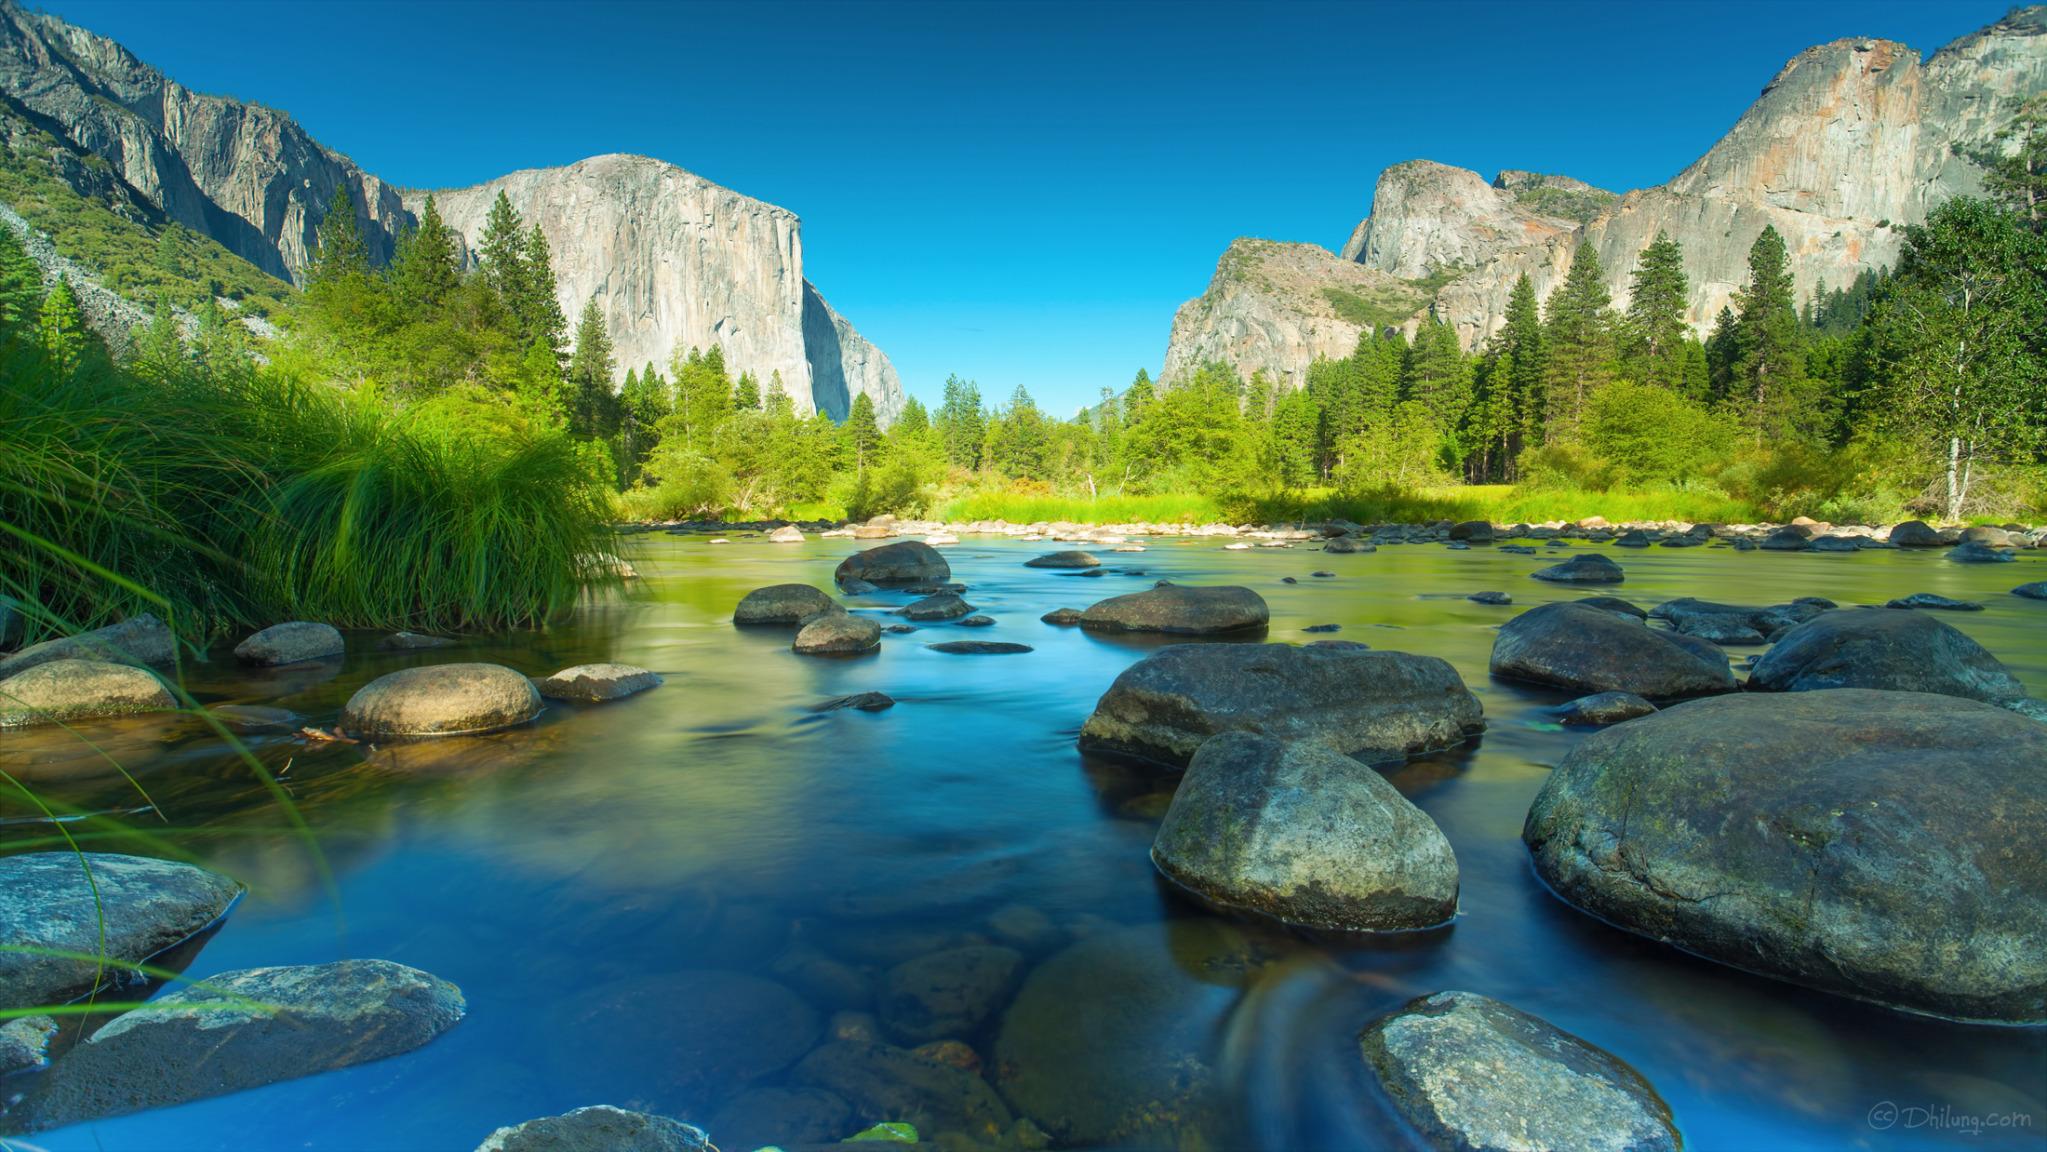 Hd wallpaper yosemite - Yosemite National Park Wallpaper Hd Wallpapers Backgrounds Of Your